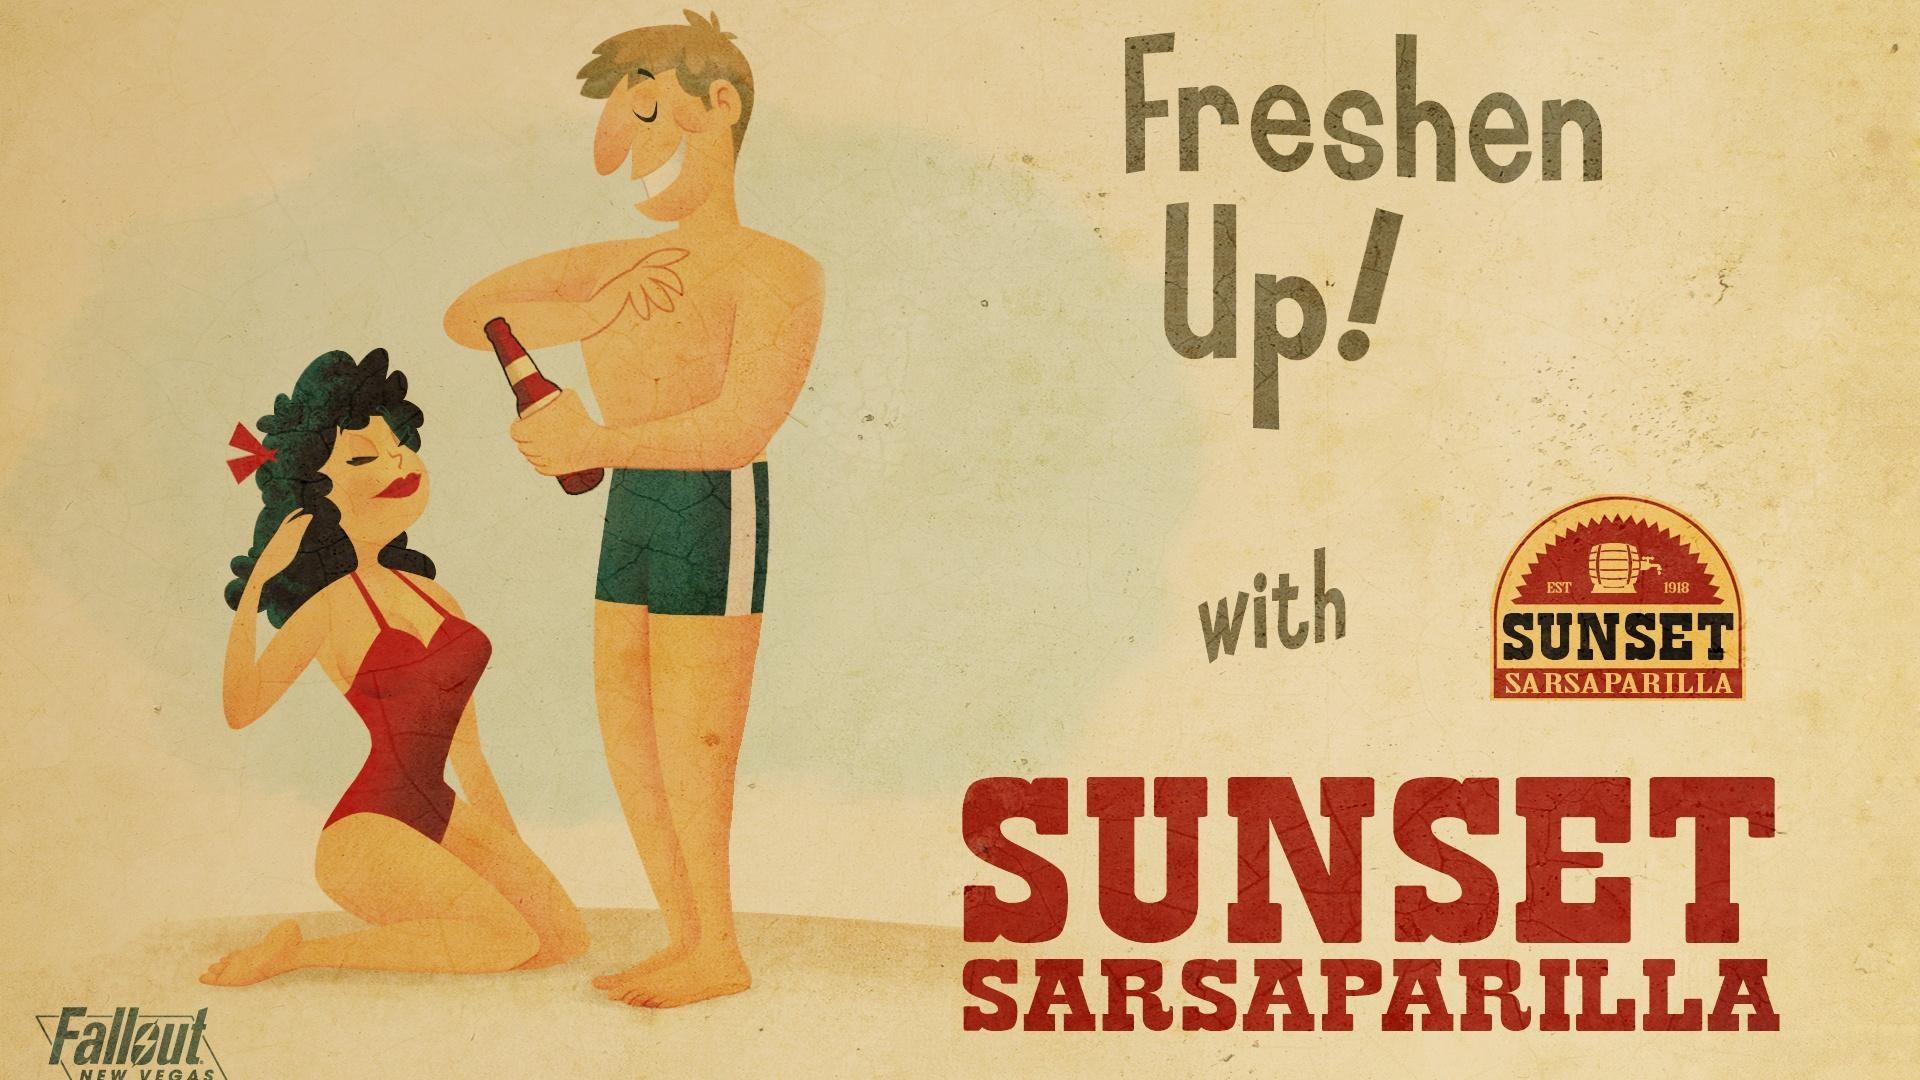 Sunset Sarsaparilla – Fallout New Vegas wallpaper 1080P .